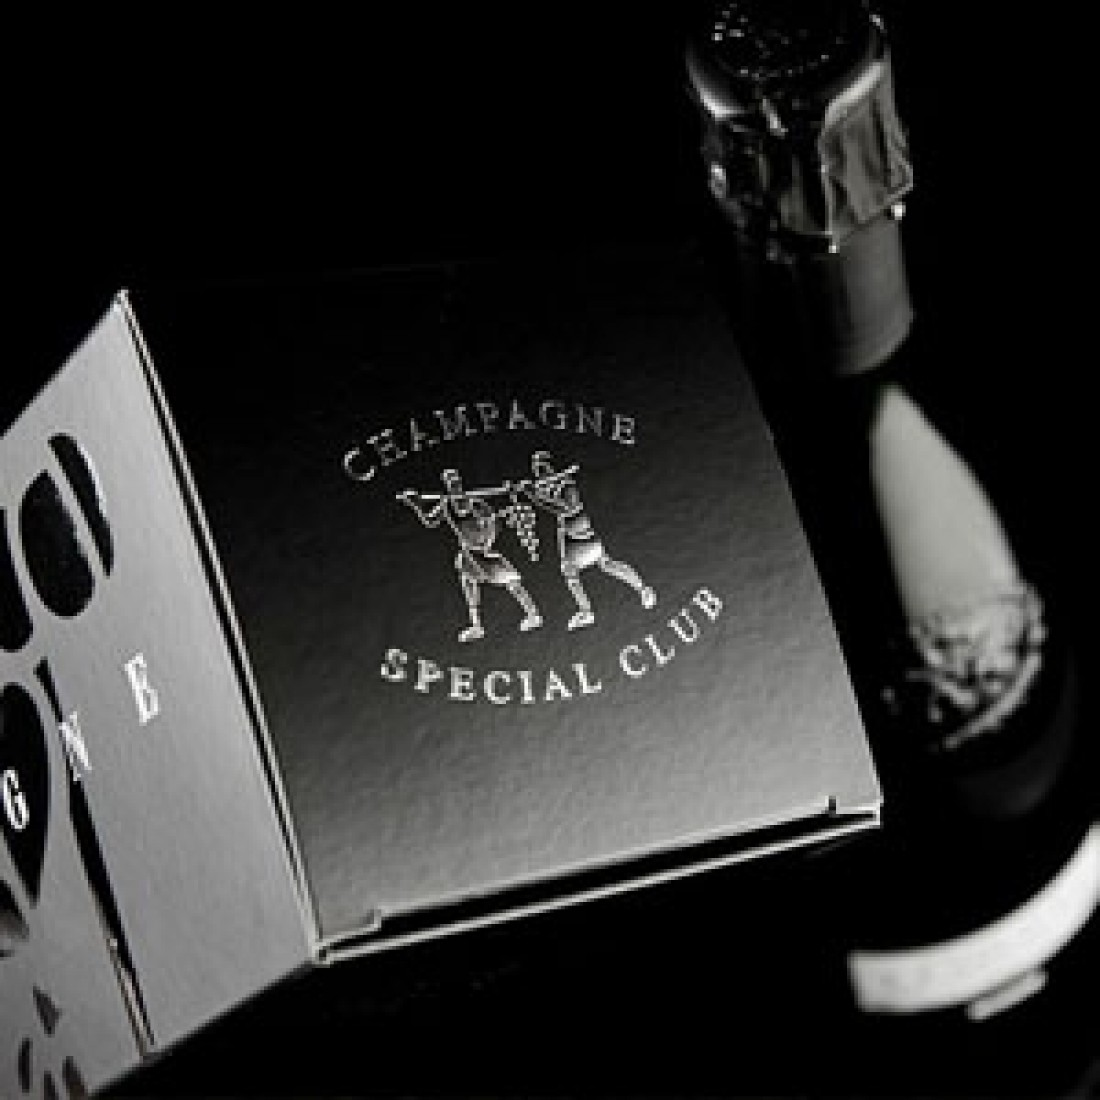 Charlier et Fils, Special Club 2005-31